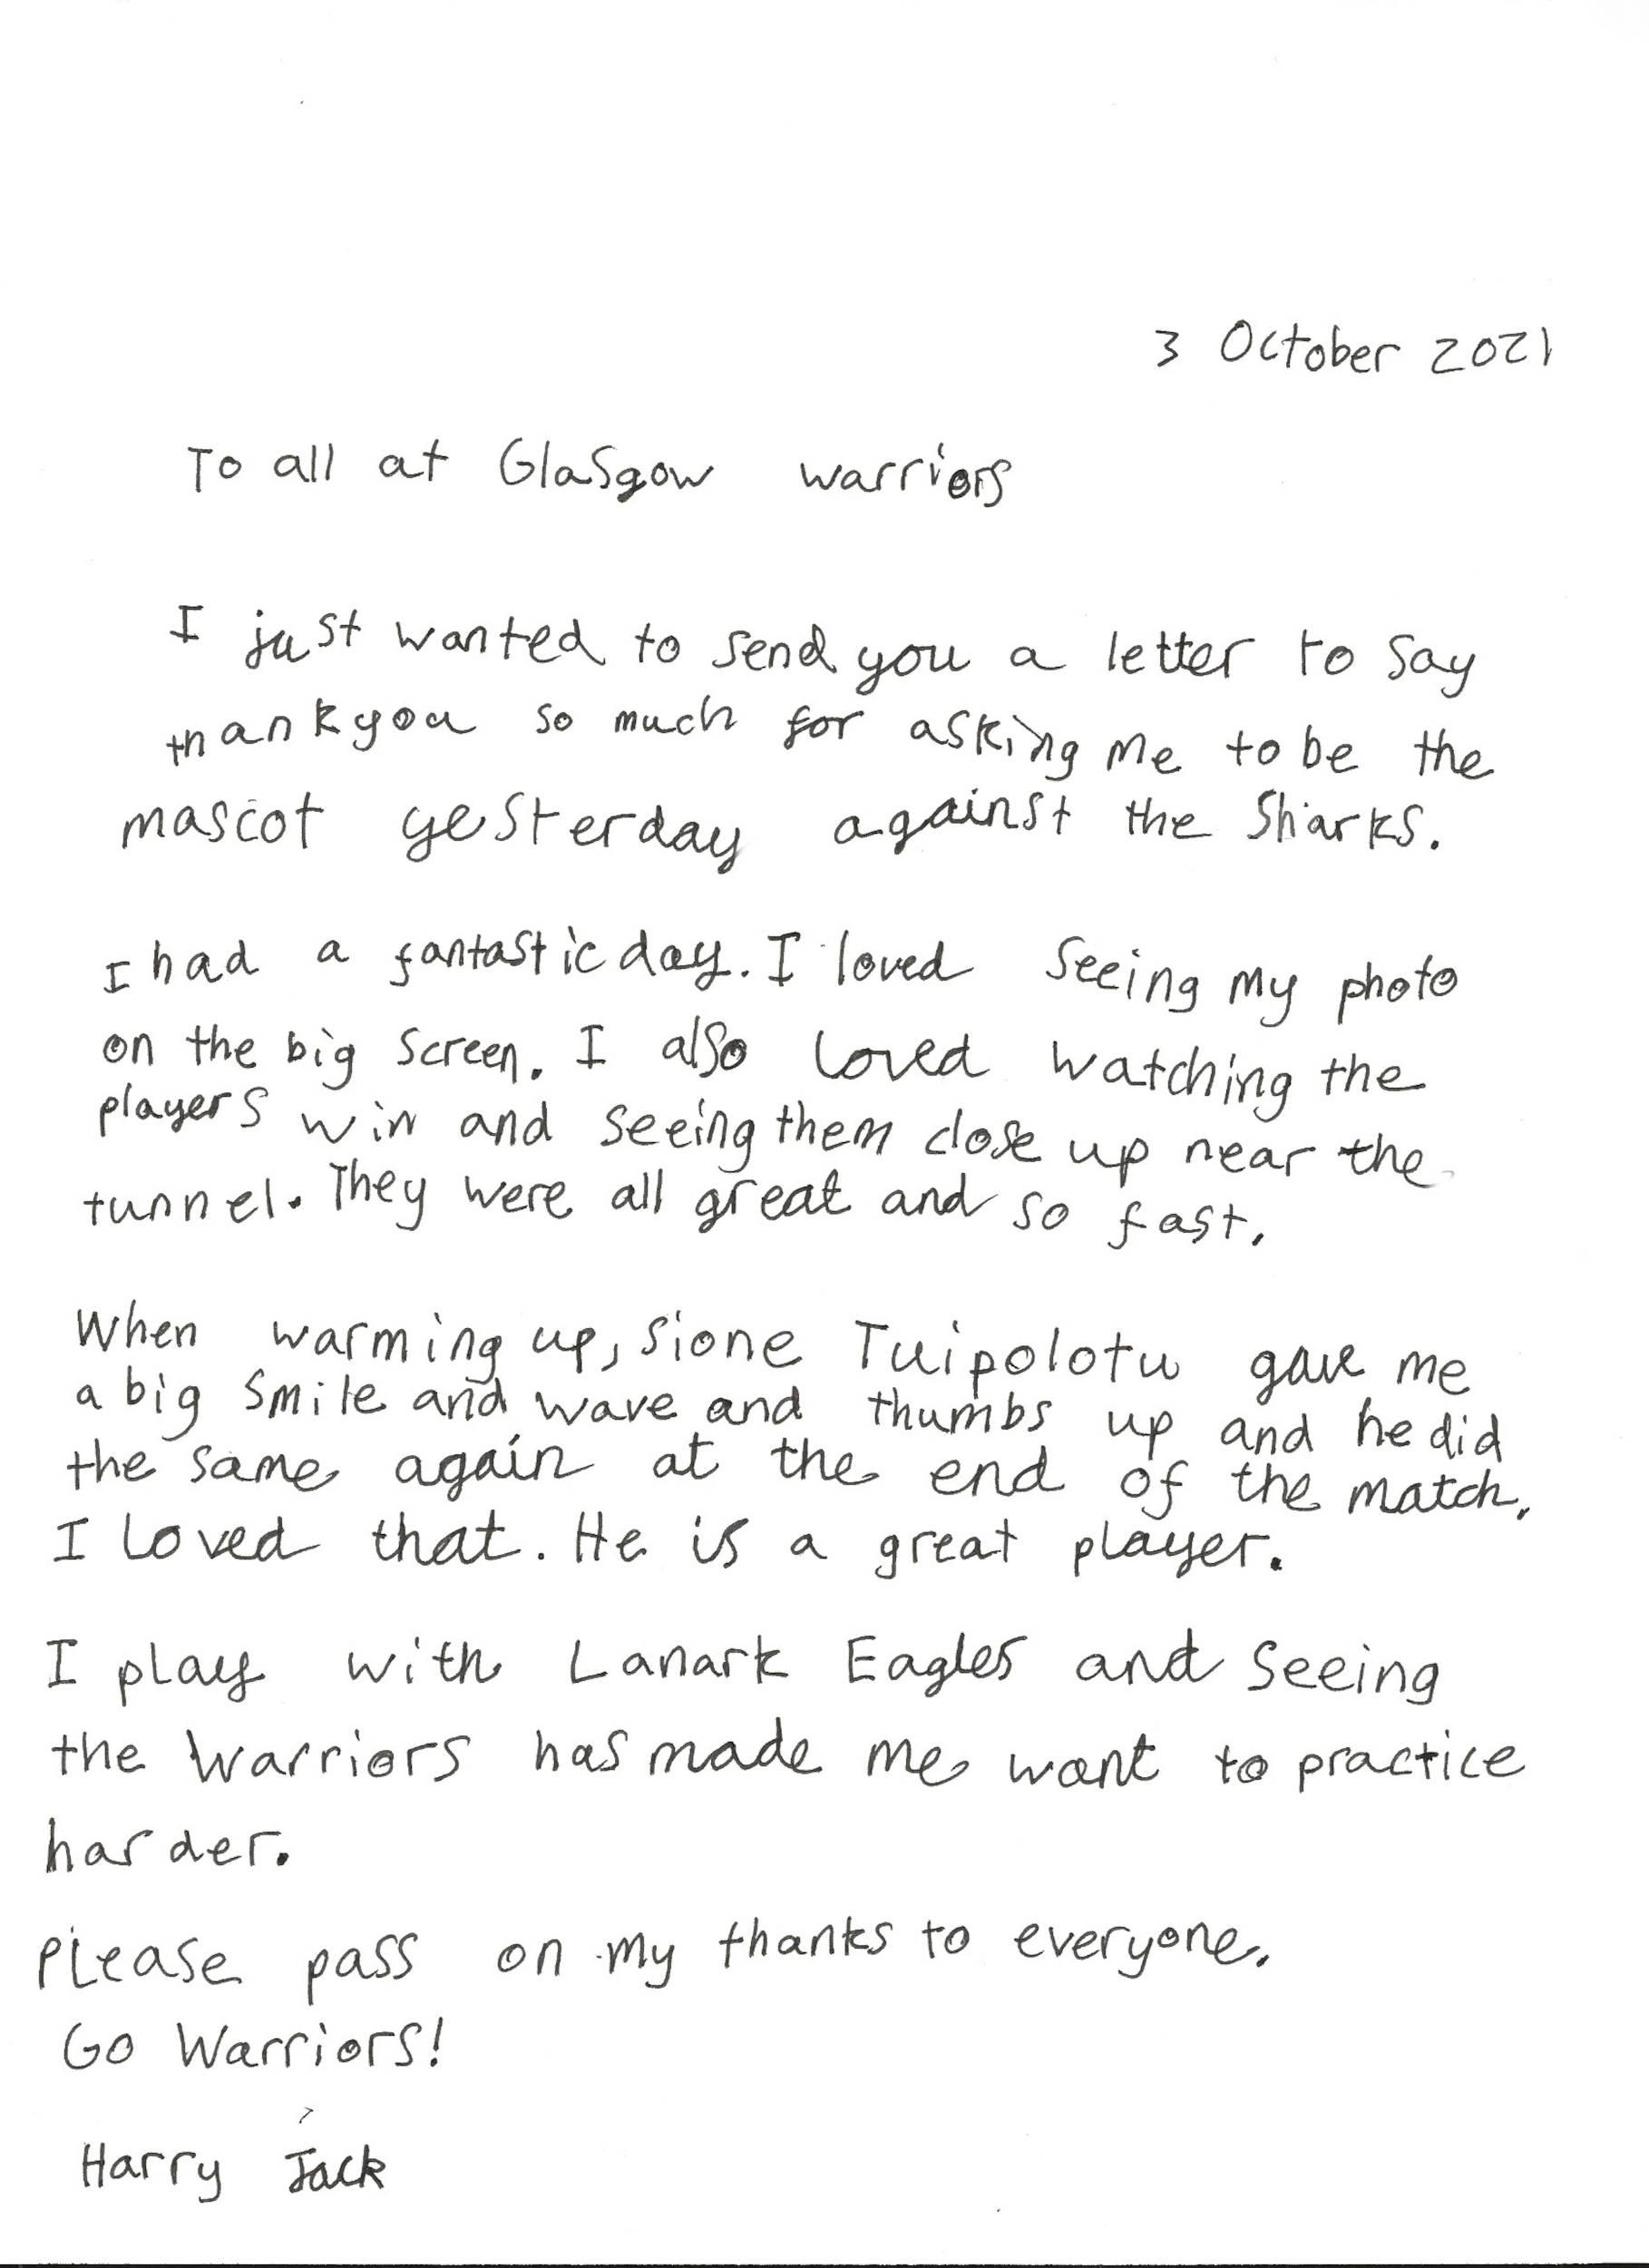 Harry Jack's heartwarming handwritten letter to Glasgow Warriors